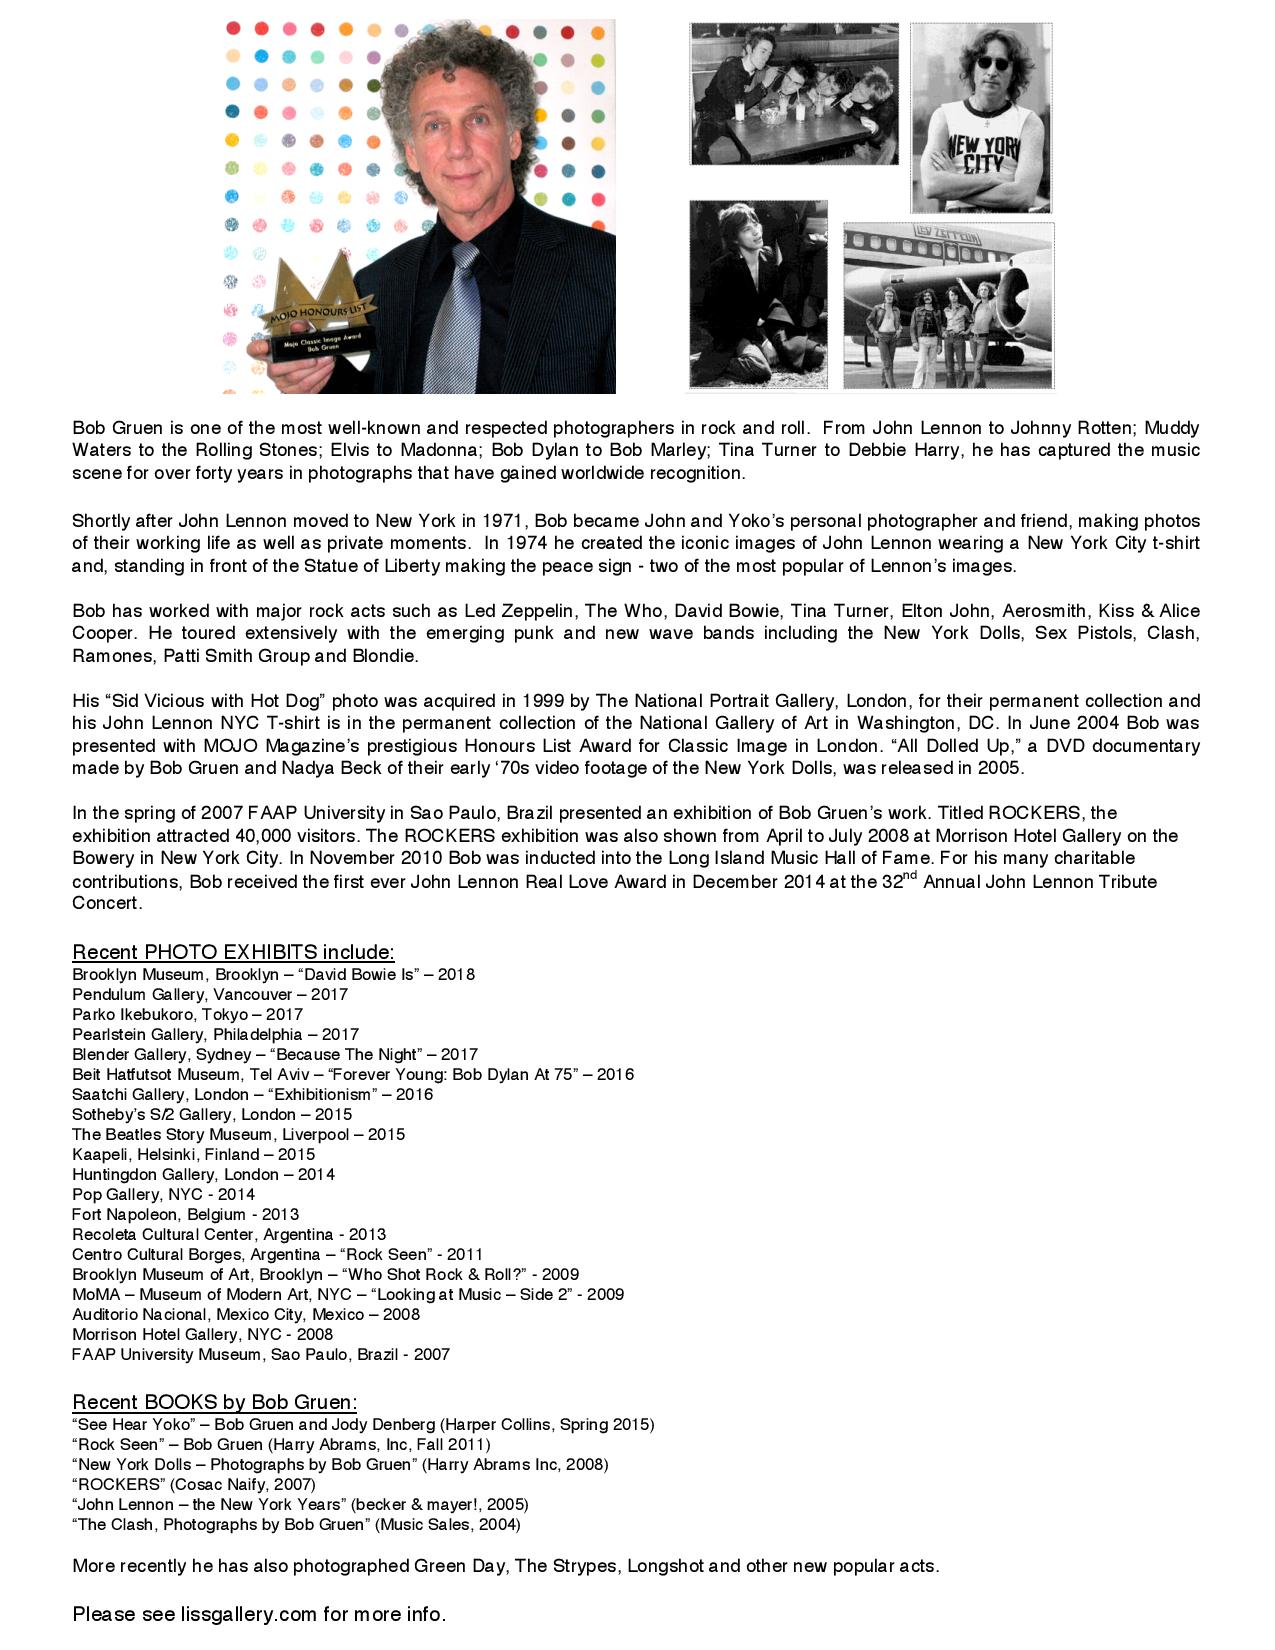 BobGruen_bio2018 LissGallery-page-001.jpg